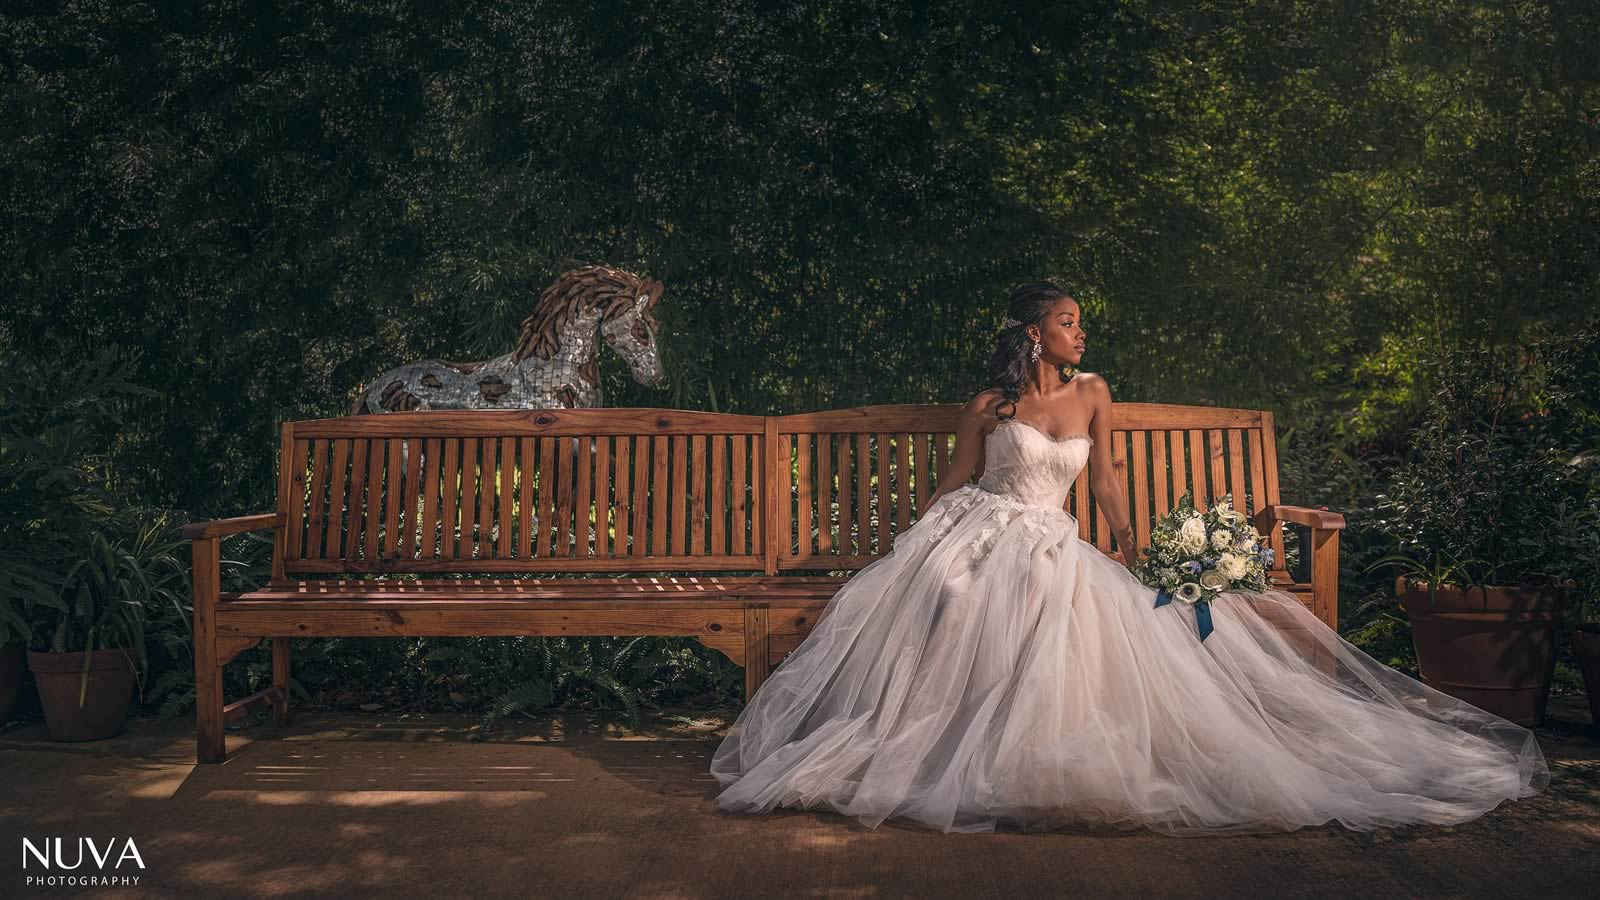 BLB Hacienda weddings and events - barn weddings